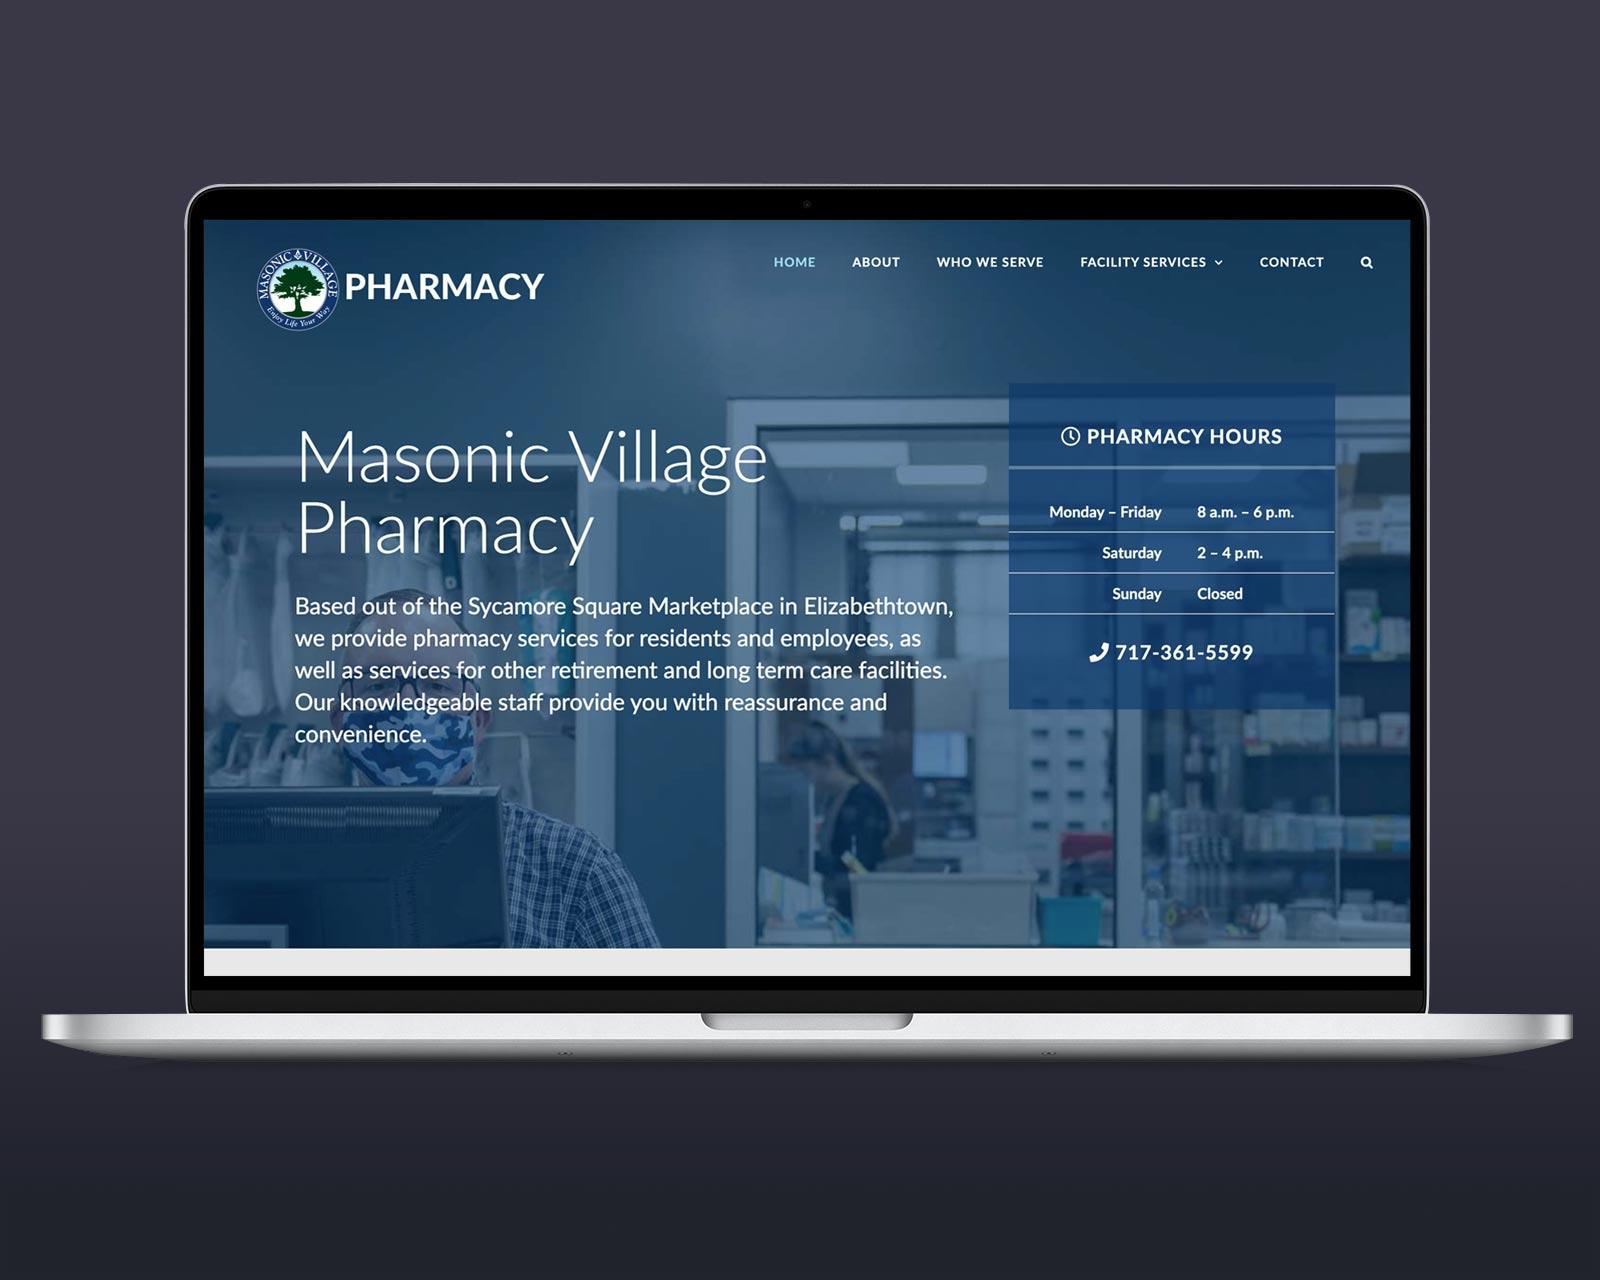 Masonic Village Pharmacy